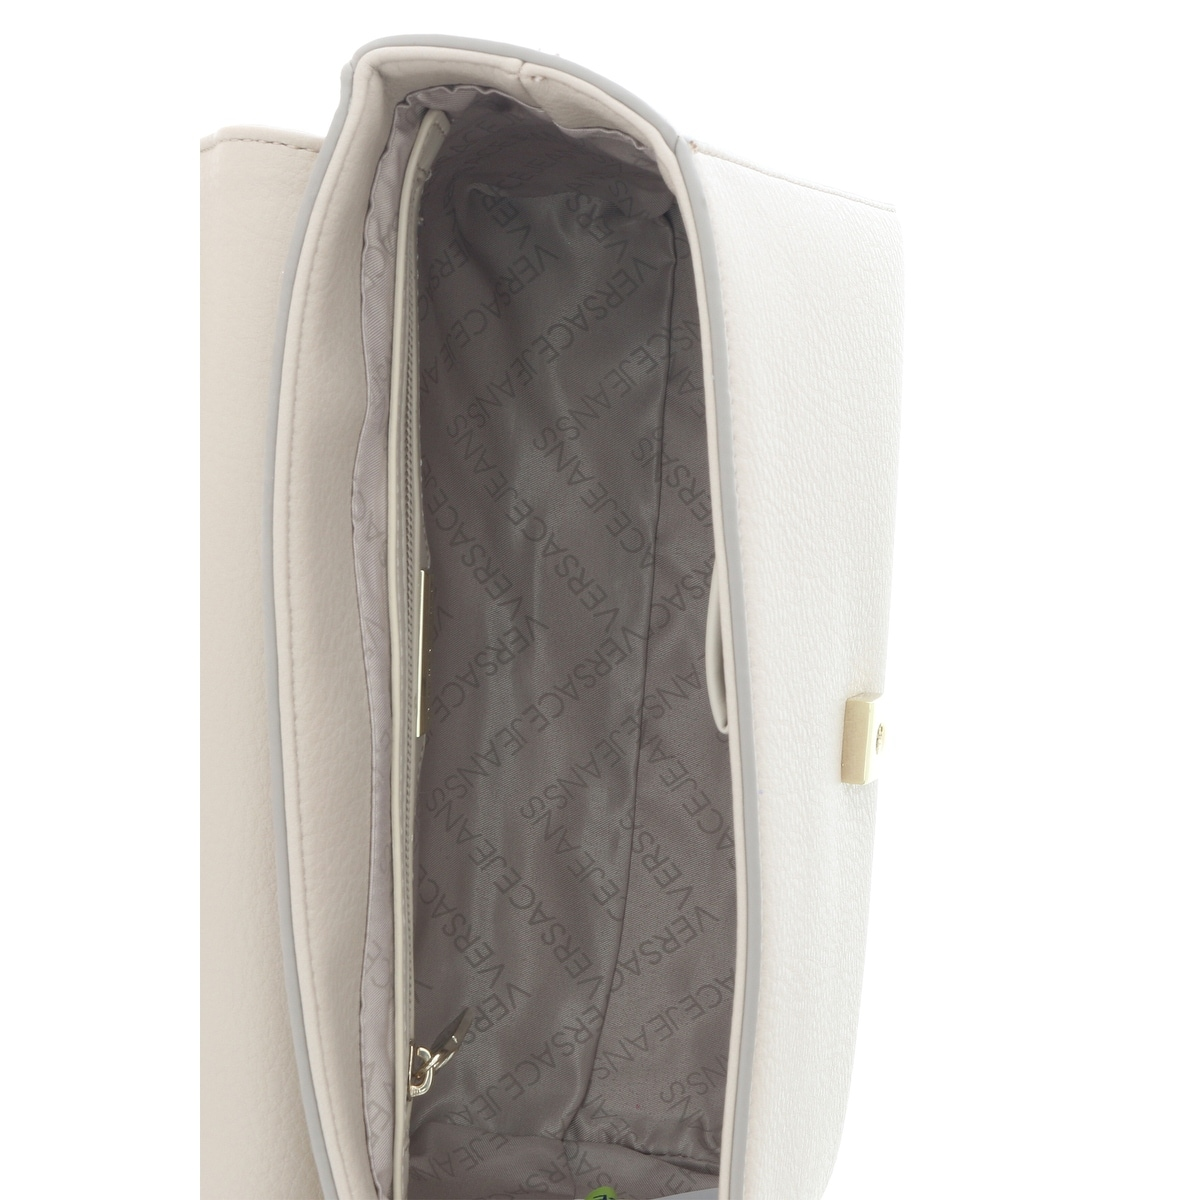 fc8521dd21 Shop Versace EE1VRBBC6 Beige Top Handle Bag - 9-7.5-4.5 - Free Shipping  Today - Overstock.com - 20223867